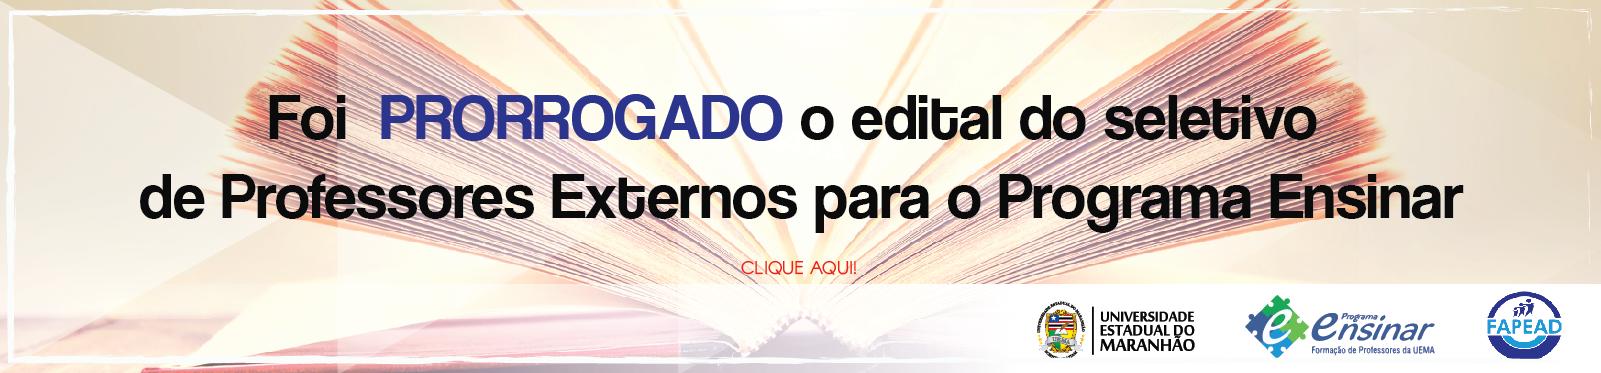 Info-fapead-slide-prorrogado